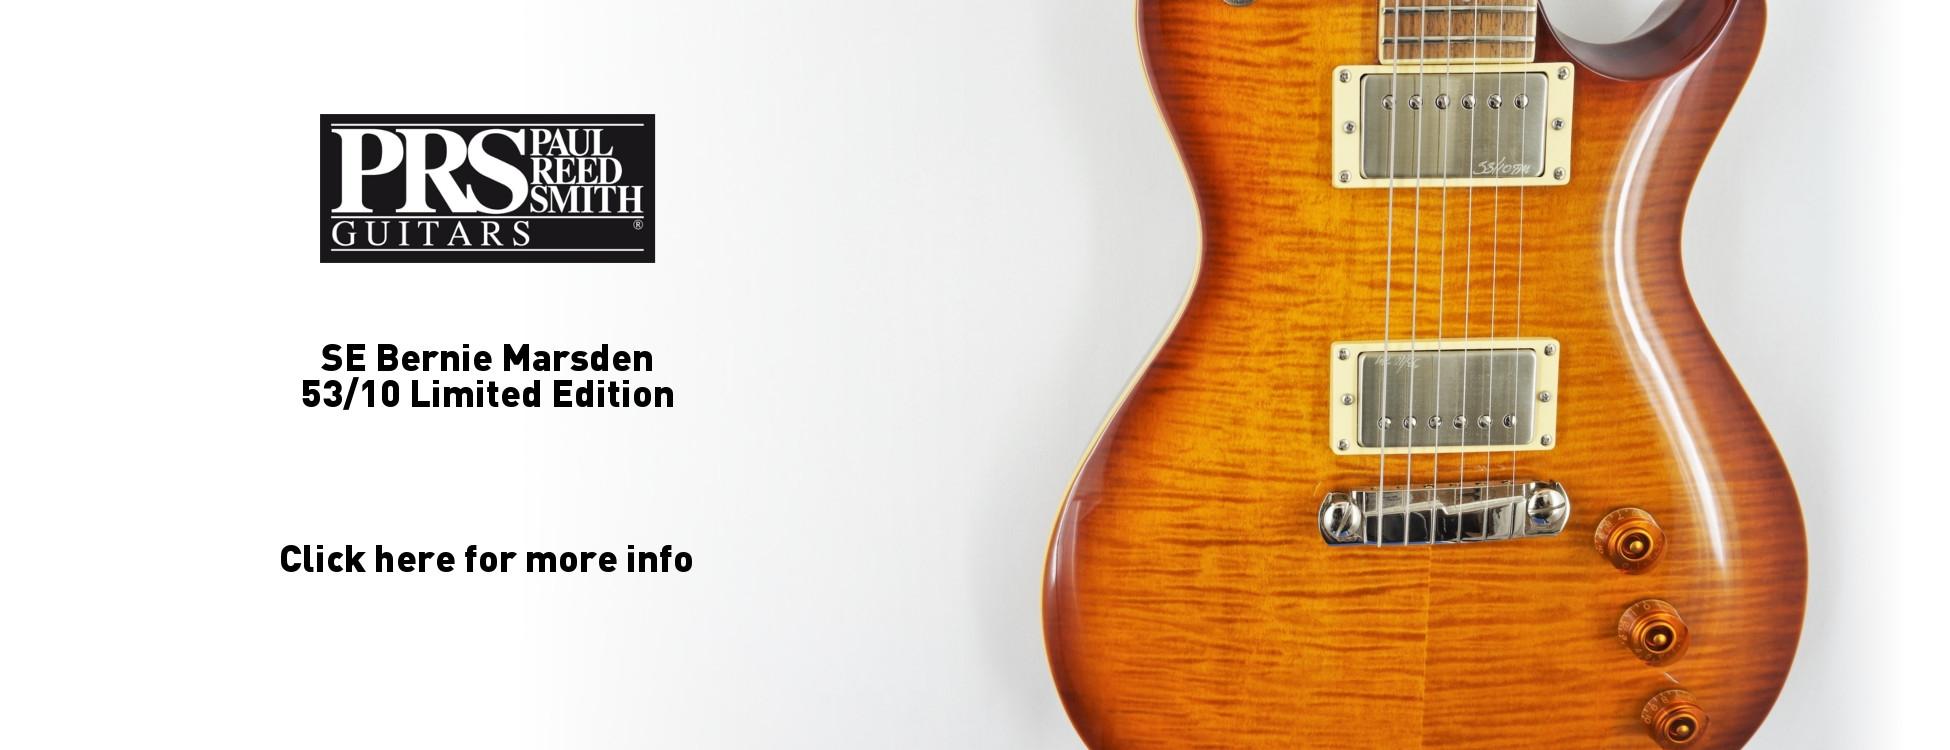 PRS SE Bernie Marsden 53/10 Limited Edition